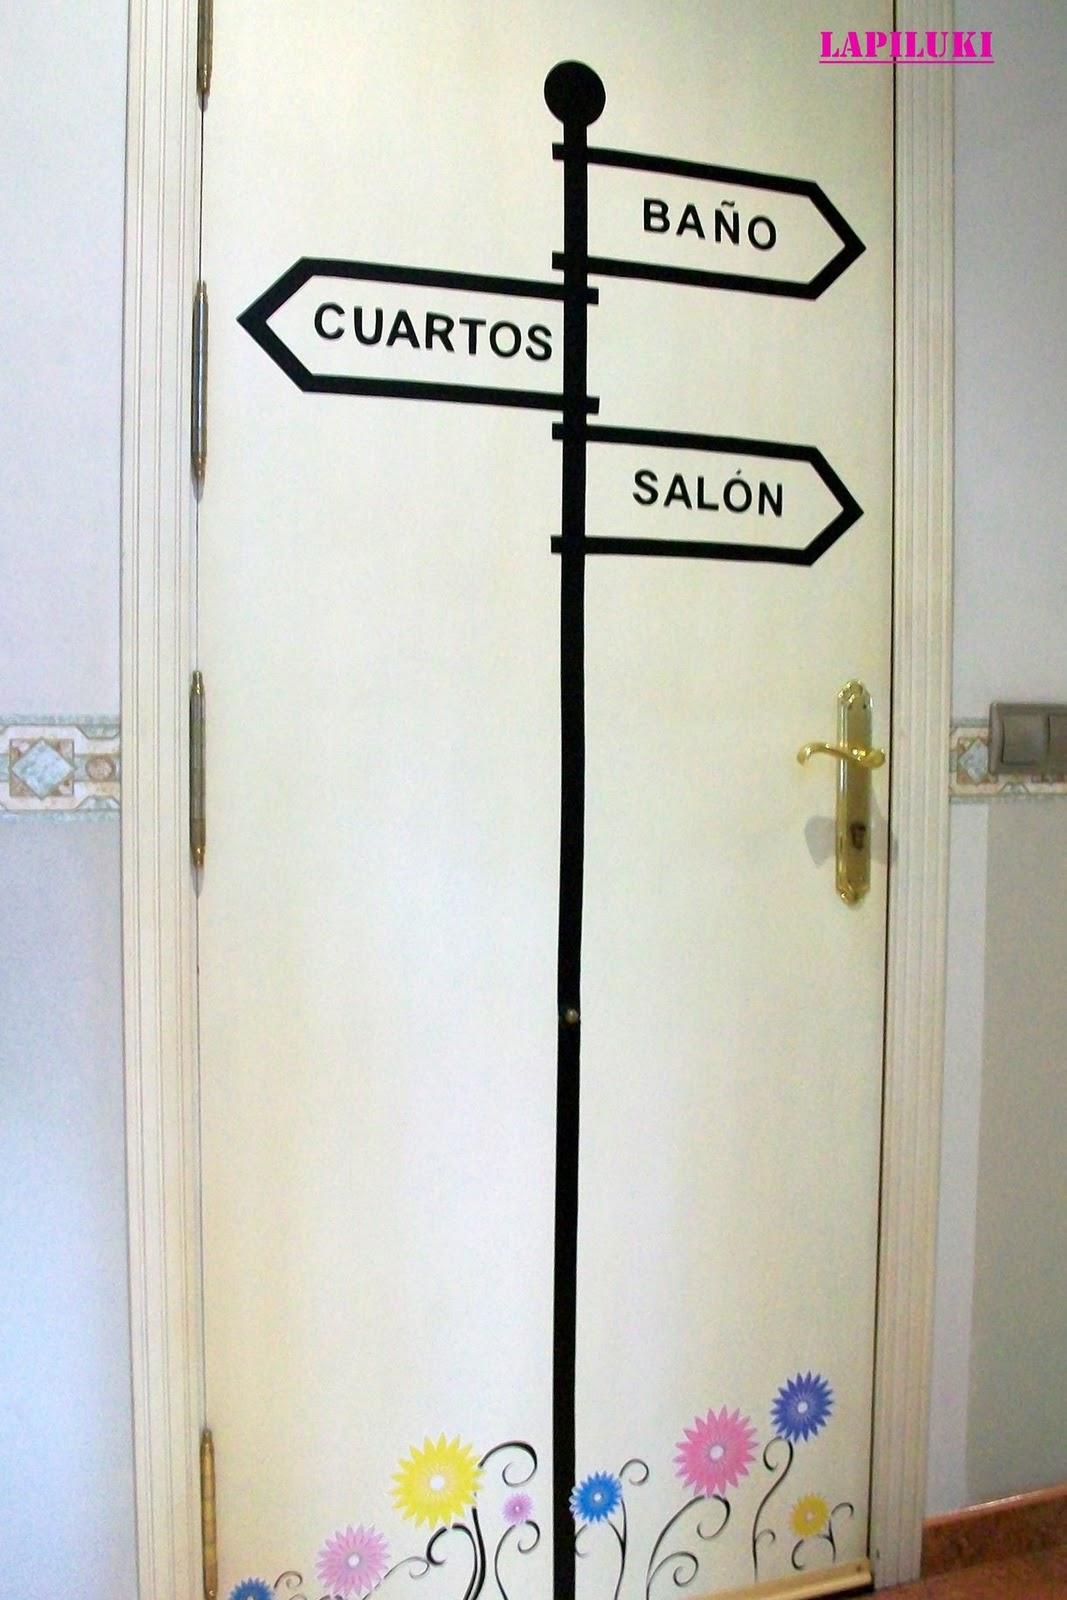 La puerta de Pilar cmo decorar con papel adhesivo x4duroscom